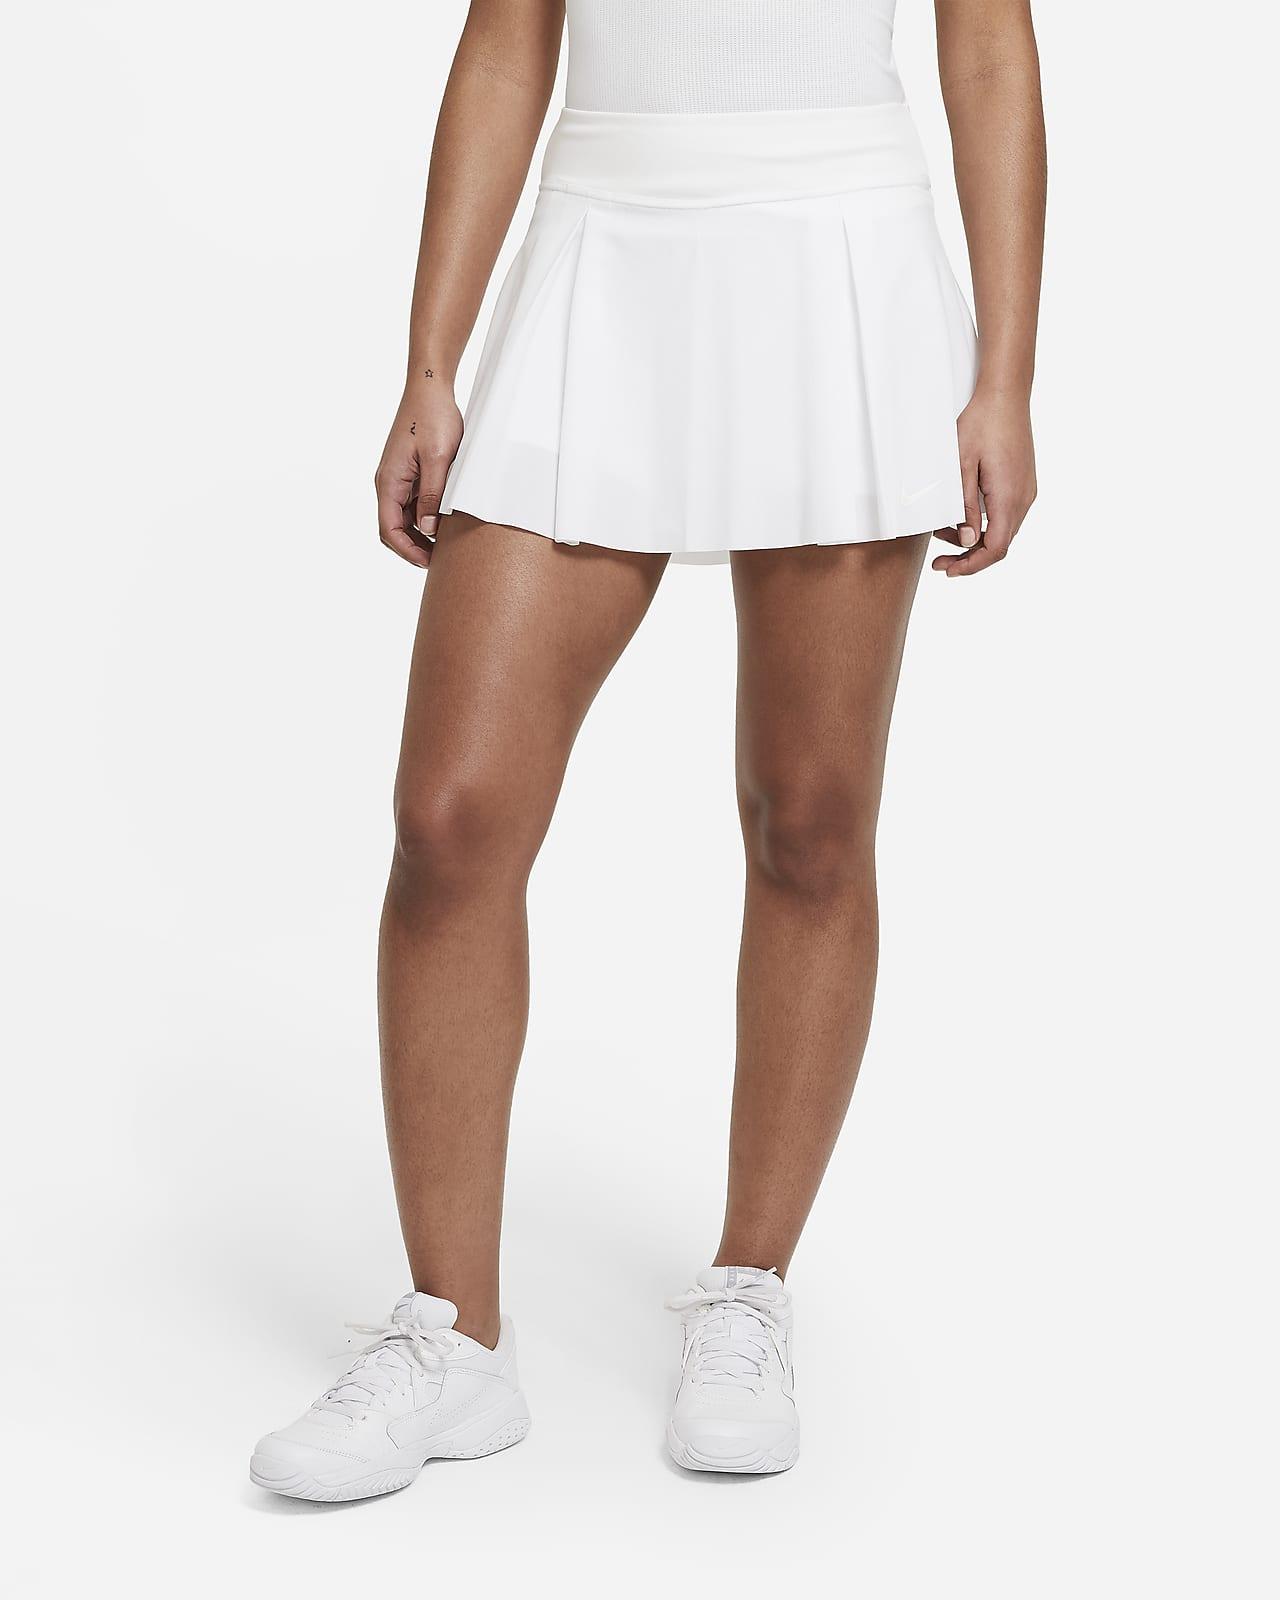 Jupe de tennis courte Nike Club Skirt pour Femme